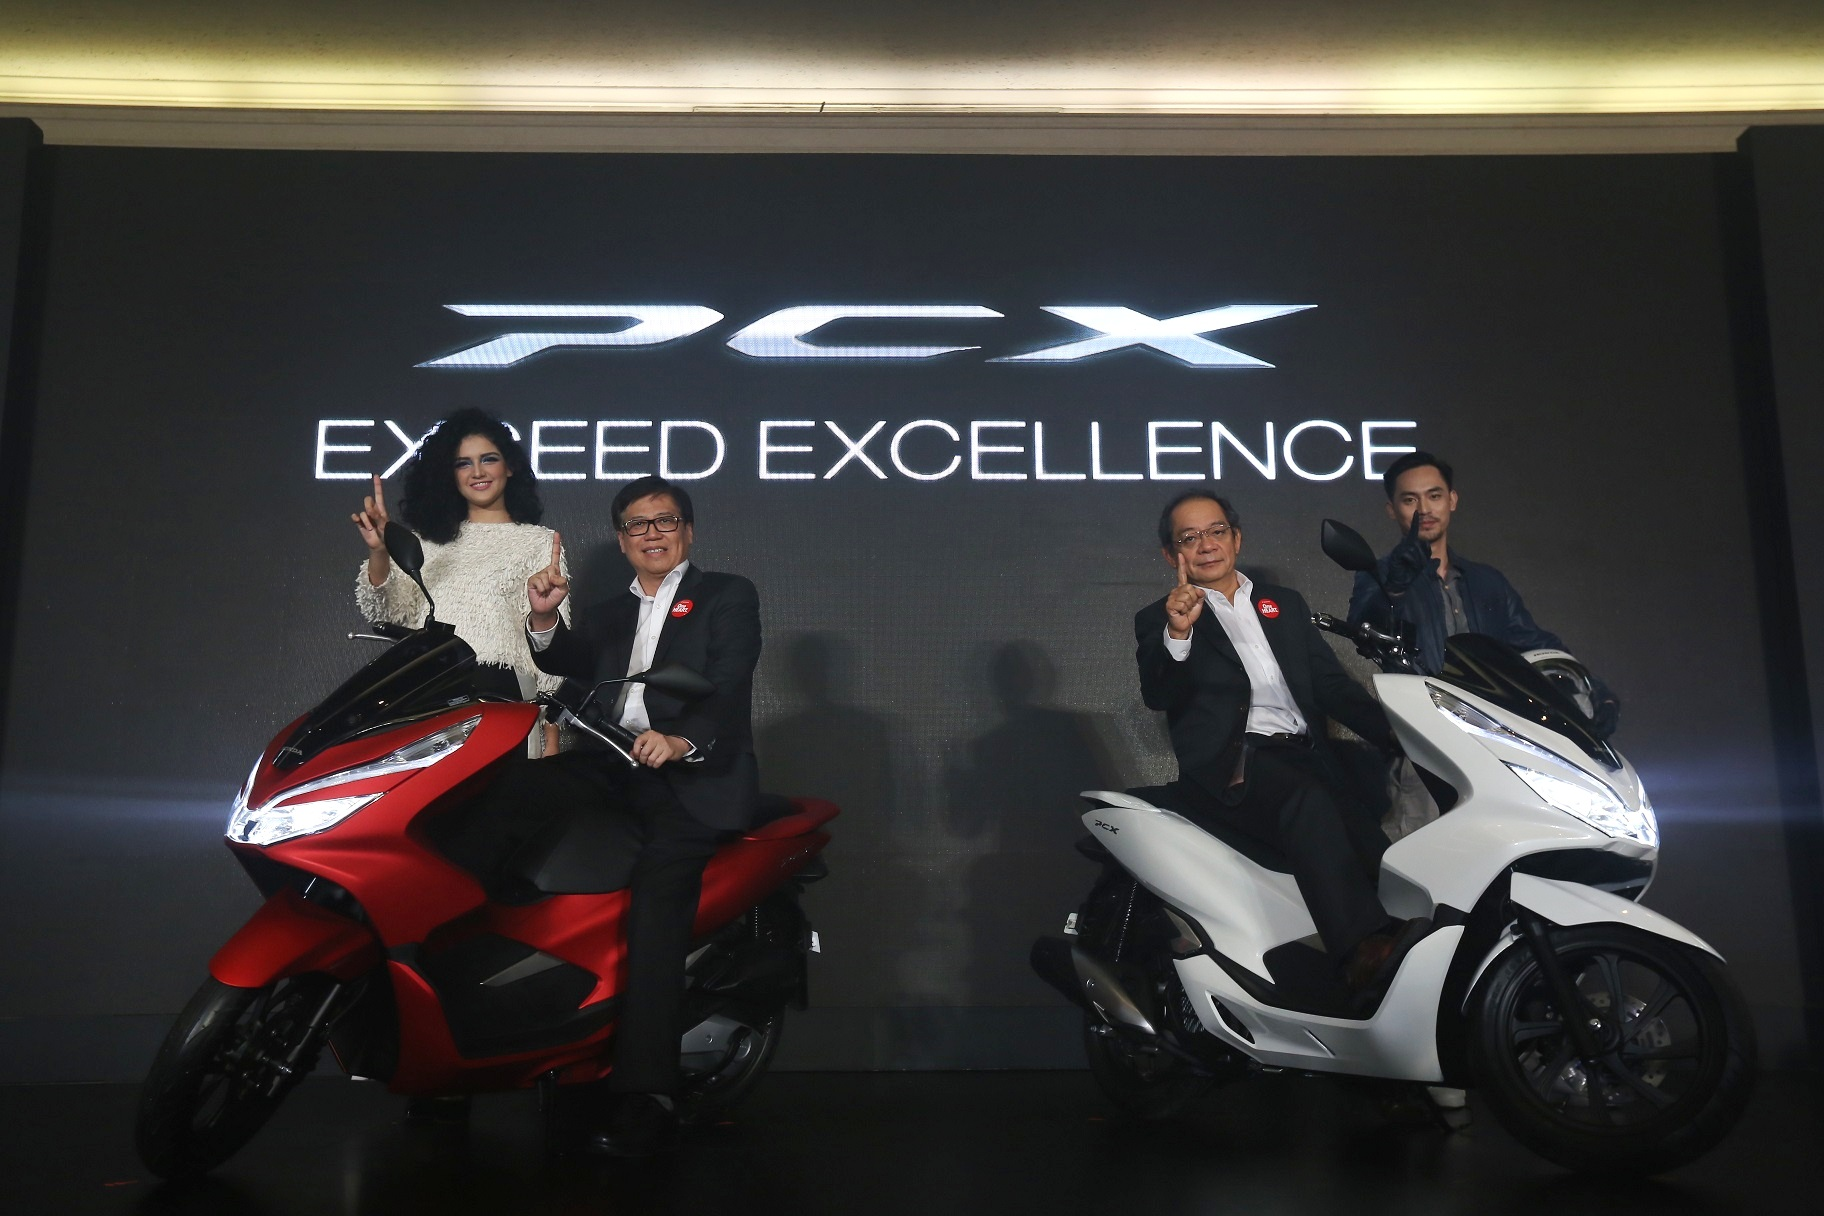 Harga Sepeda Motor Hondatrio Trio New Vario 110 Esp Cbs Glam Red Salatiga Ahm Luncurkan All Honda Pcx 150